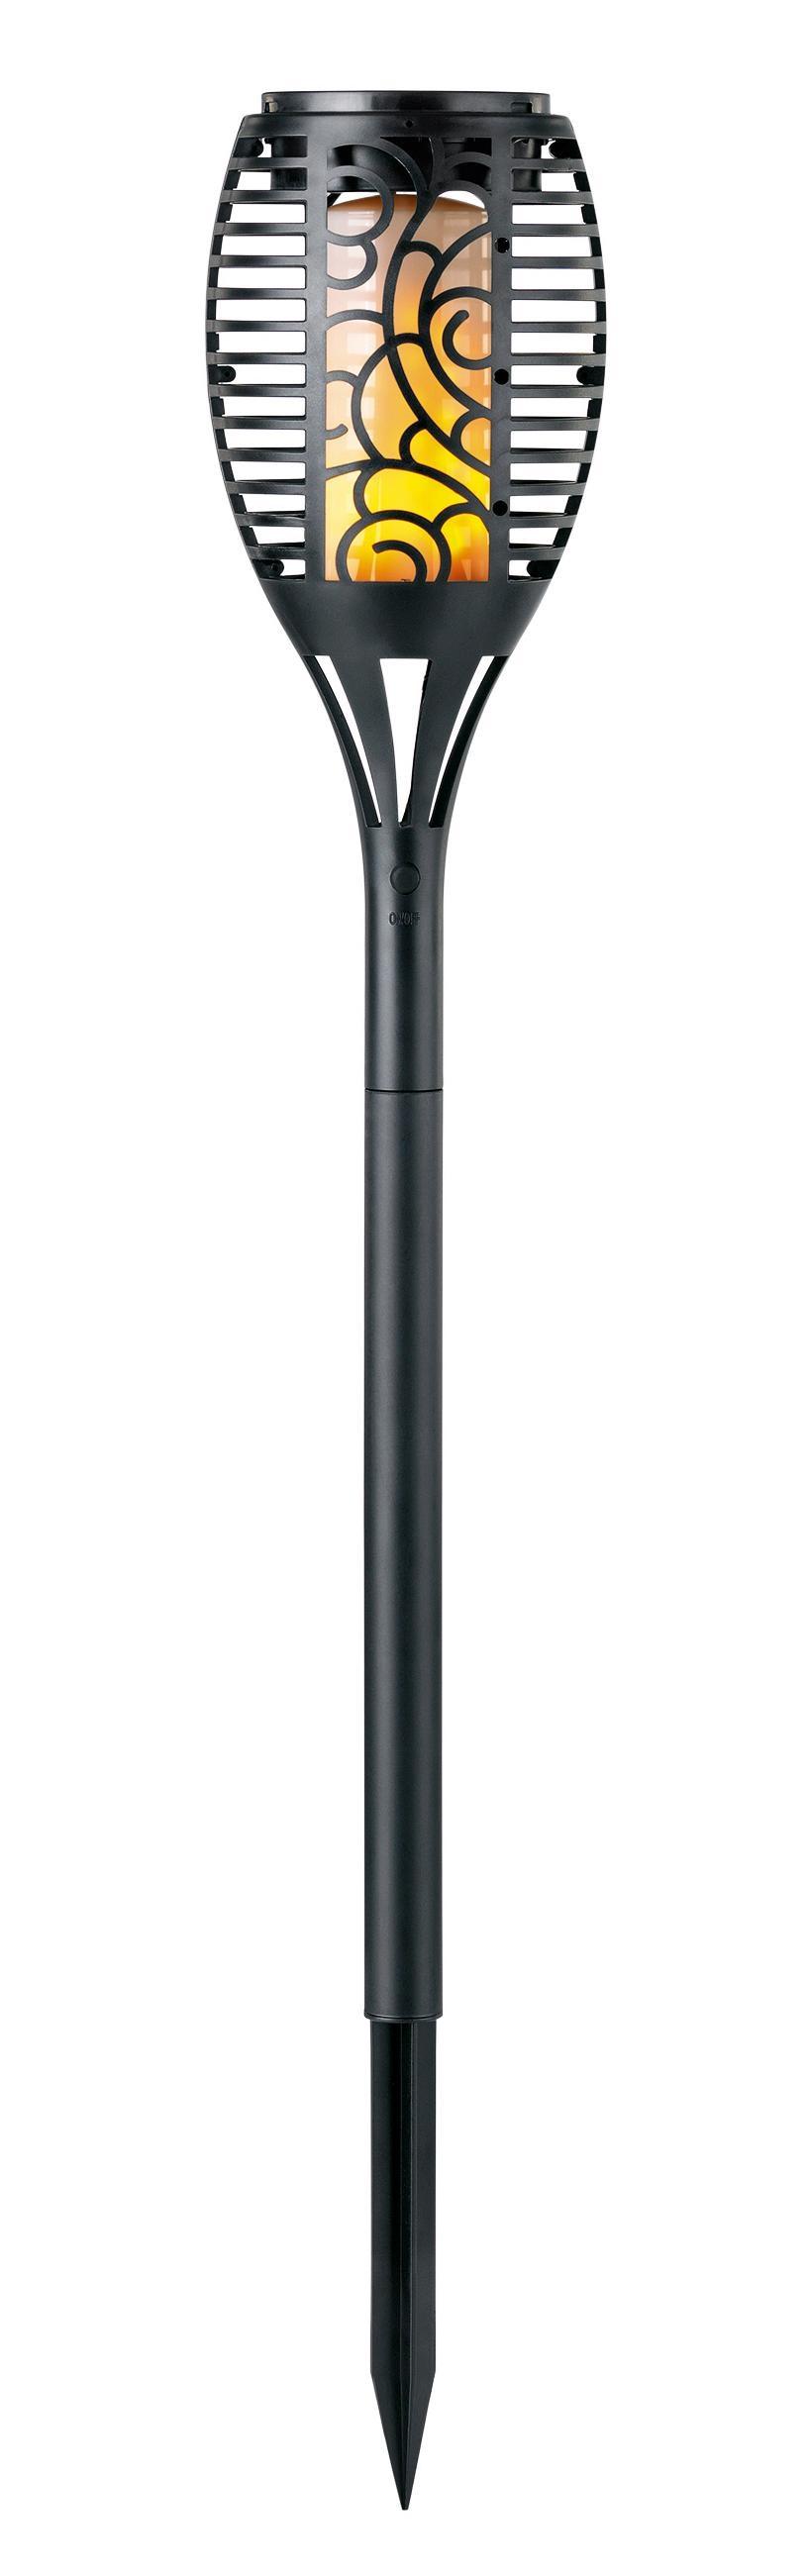 EASYmaxx,LED Gartenleuchte LED Fackel, schwarz